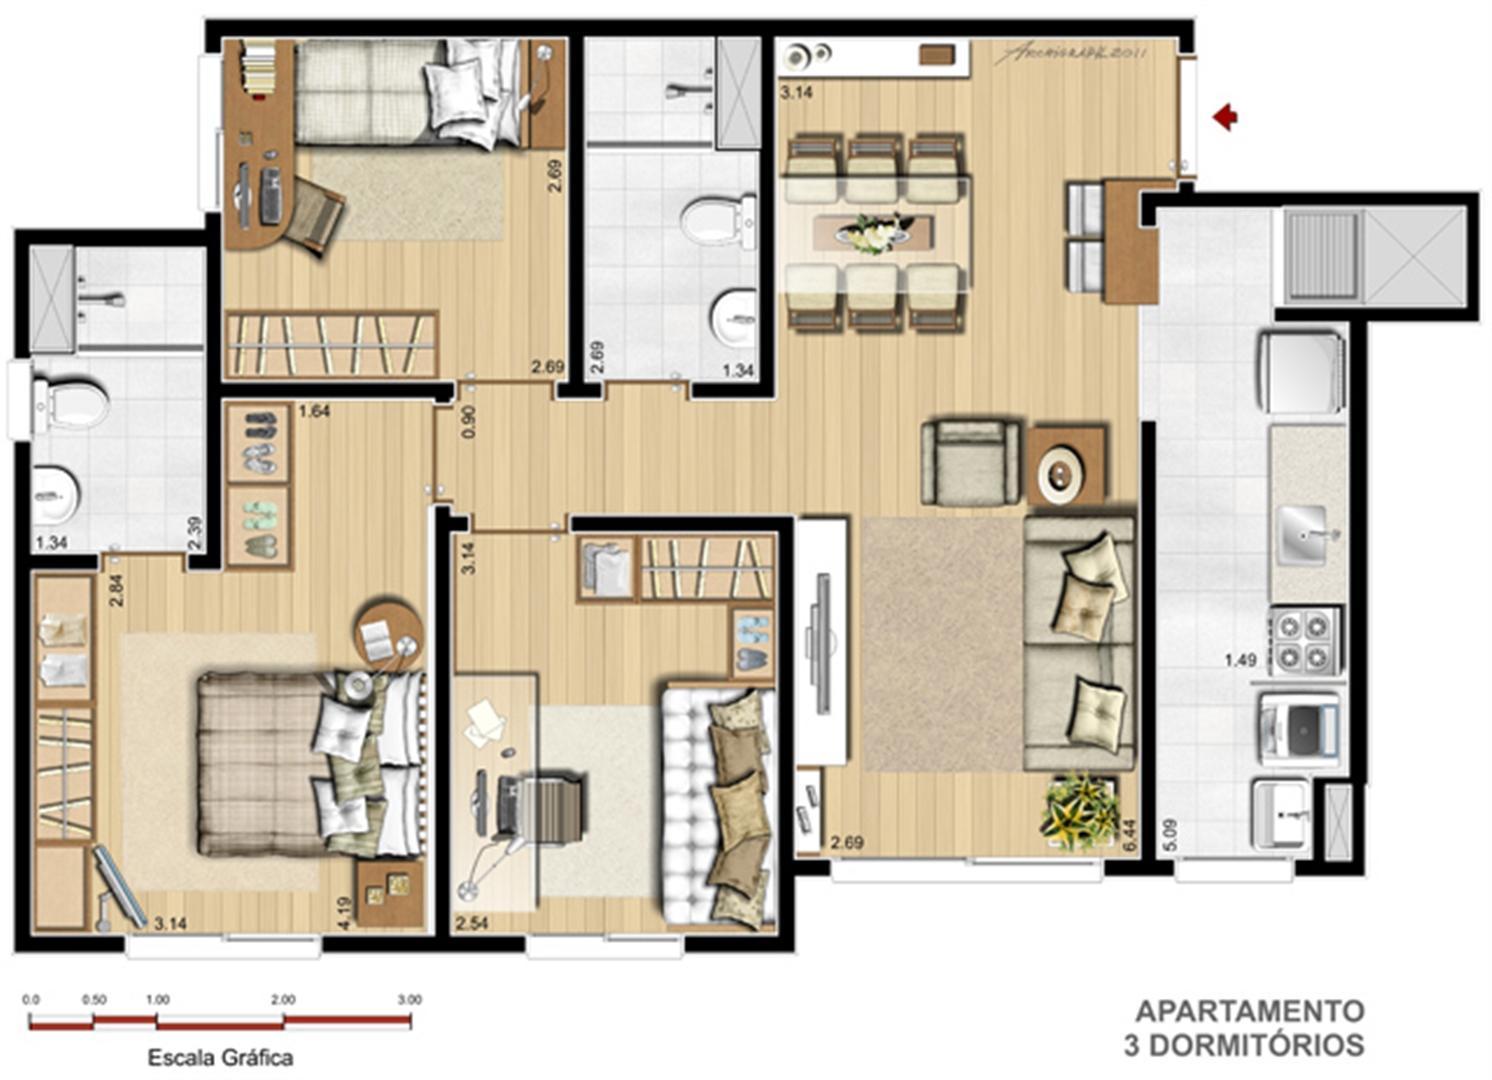 Apto. 3 dorms. com suíte - 70,58 m² | Way – Apartamentono  Junto ao Menino Deus - Porto Alegre - Rio Grande do Sul